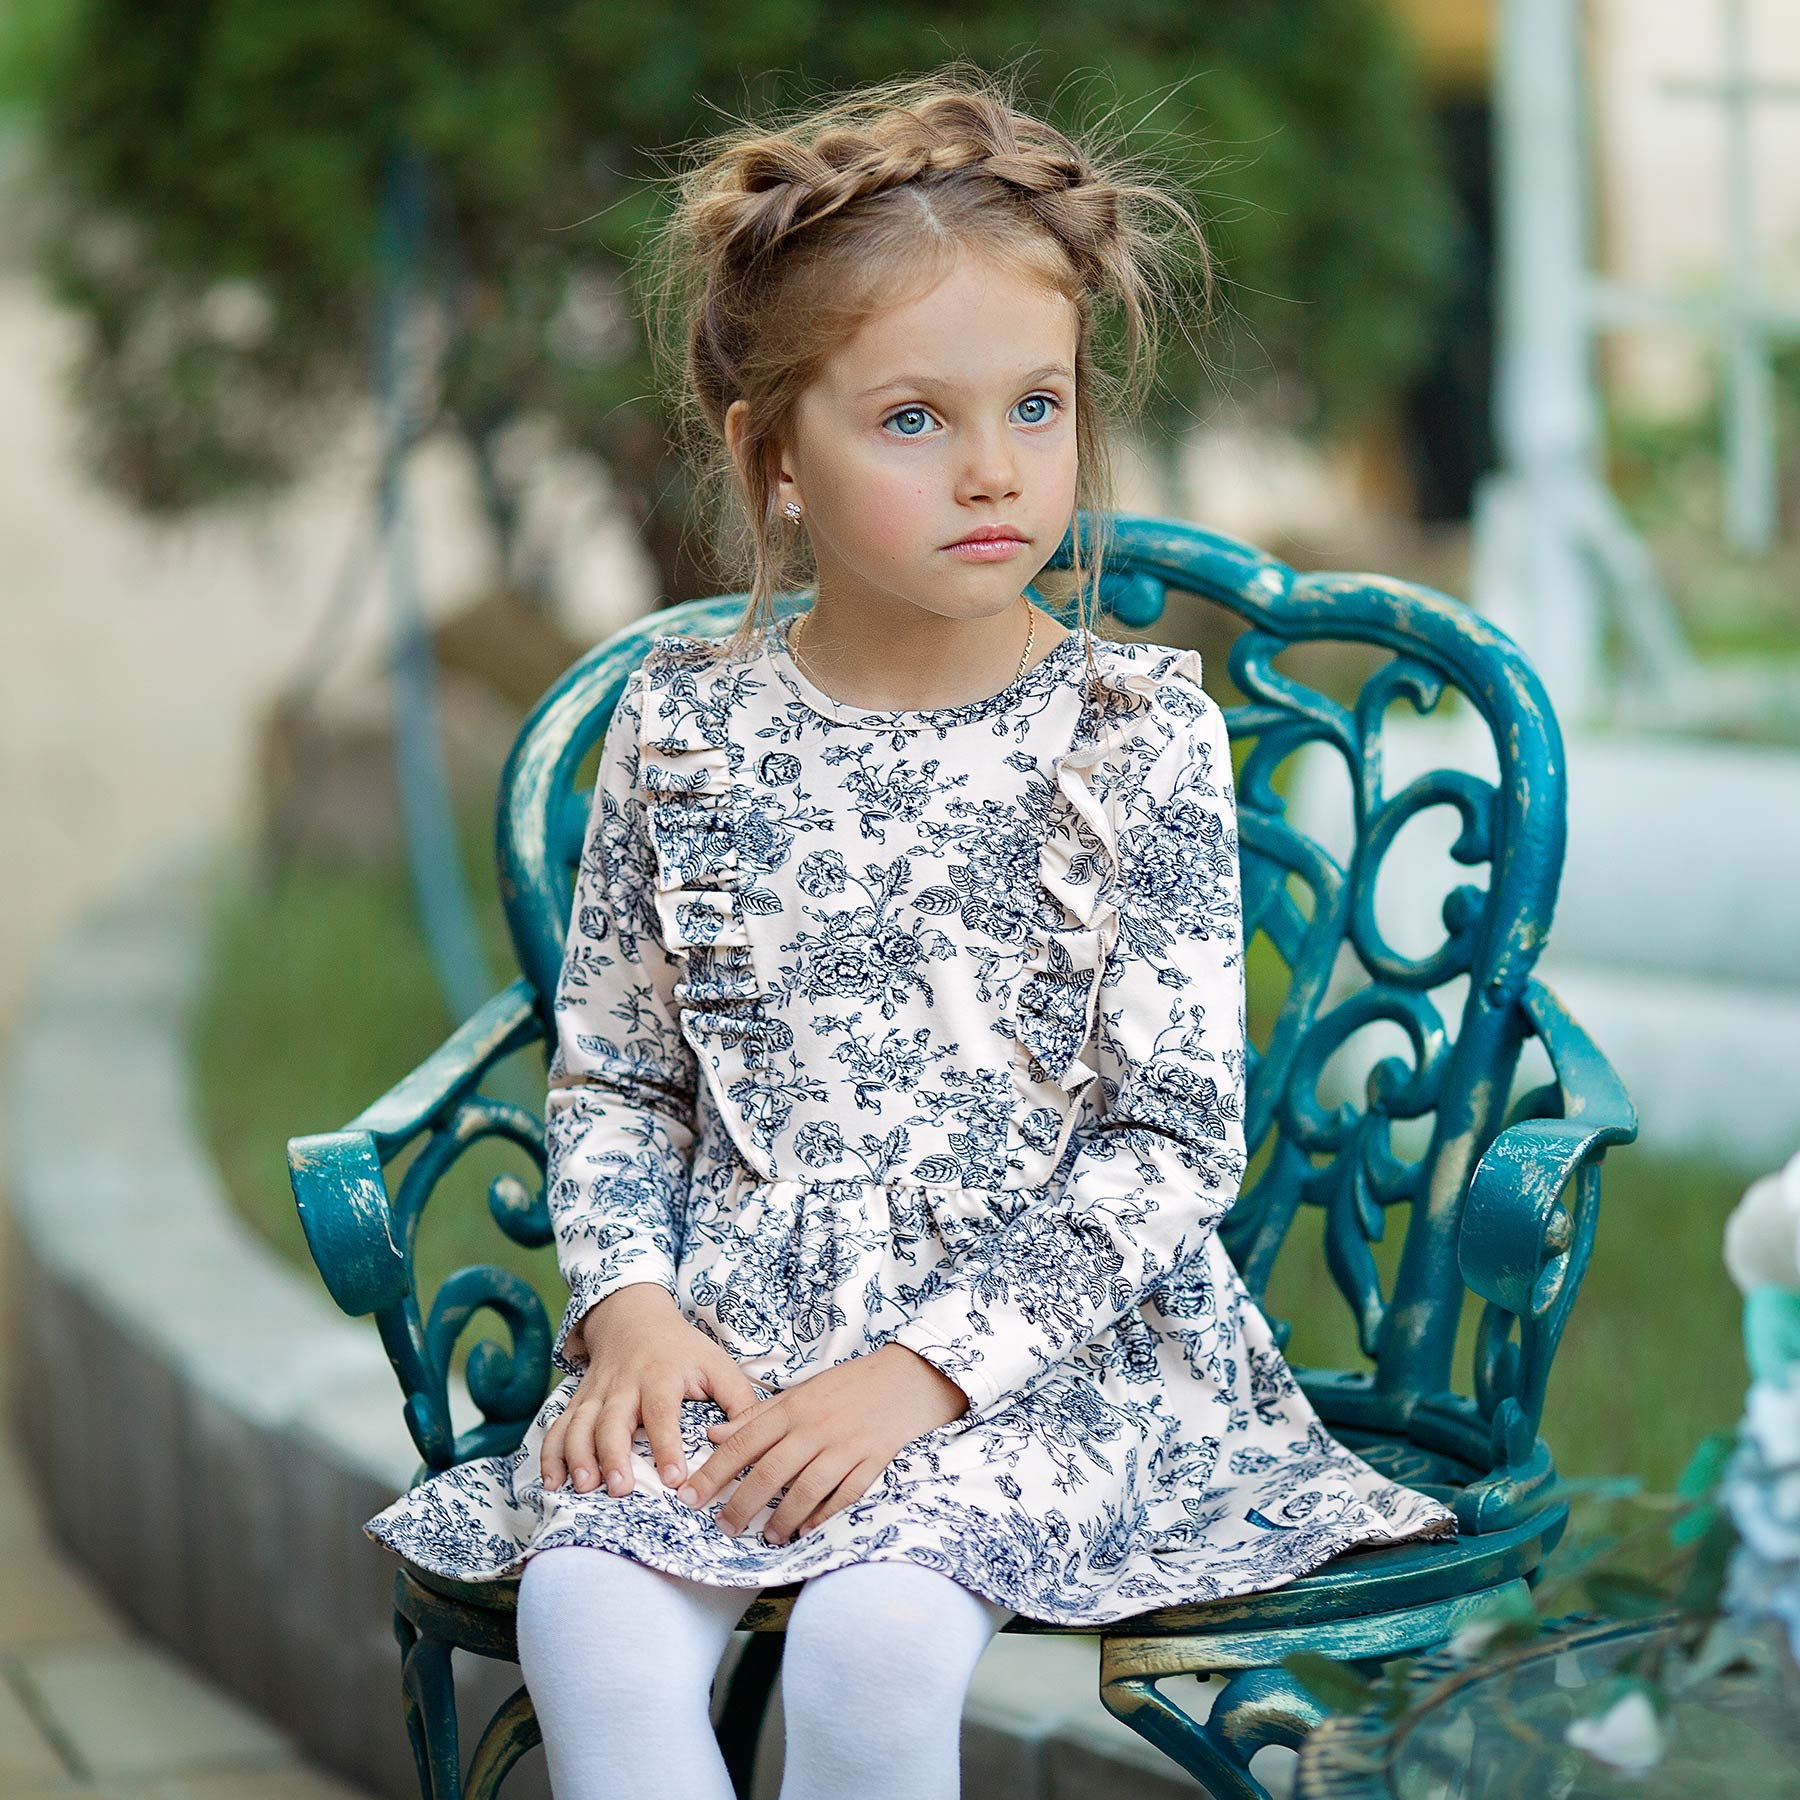 BOSSA NOVA Children Girl's White Flower Dress 148B-187 newest rainbow tutu tulle baby bridesmaid flower girl wedding dress fluffy ball gown usa birthday evening prom cloth party dress